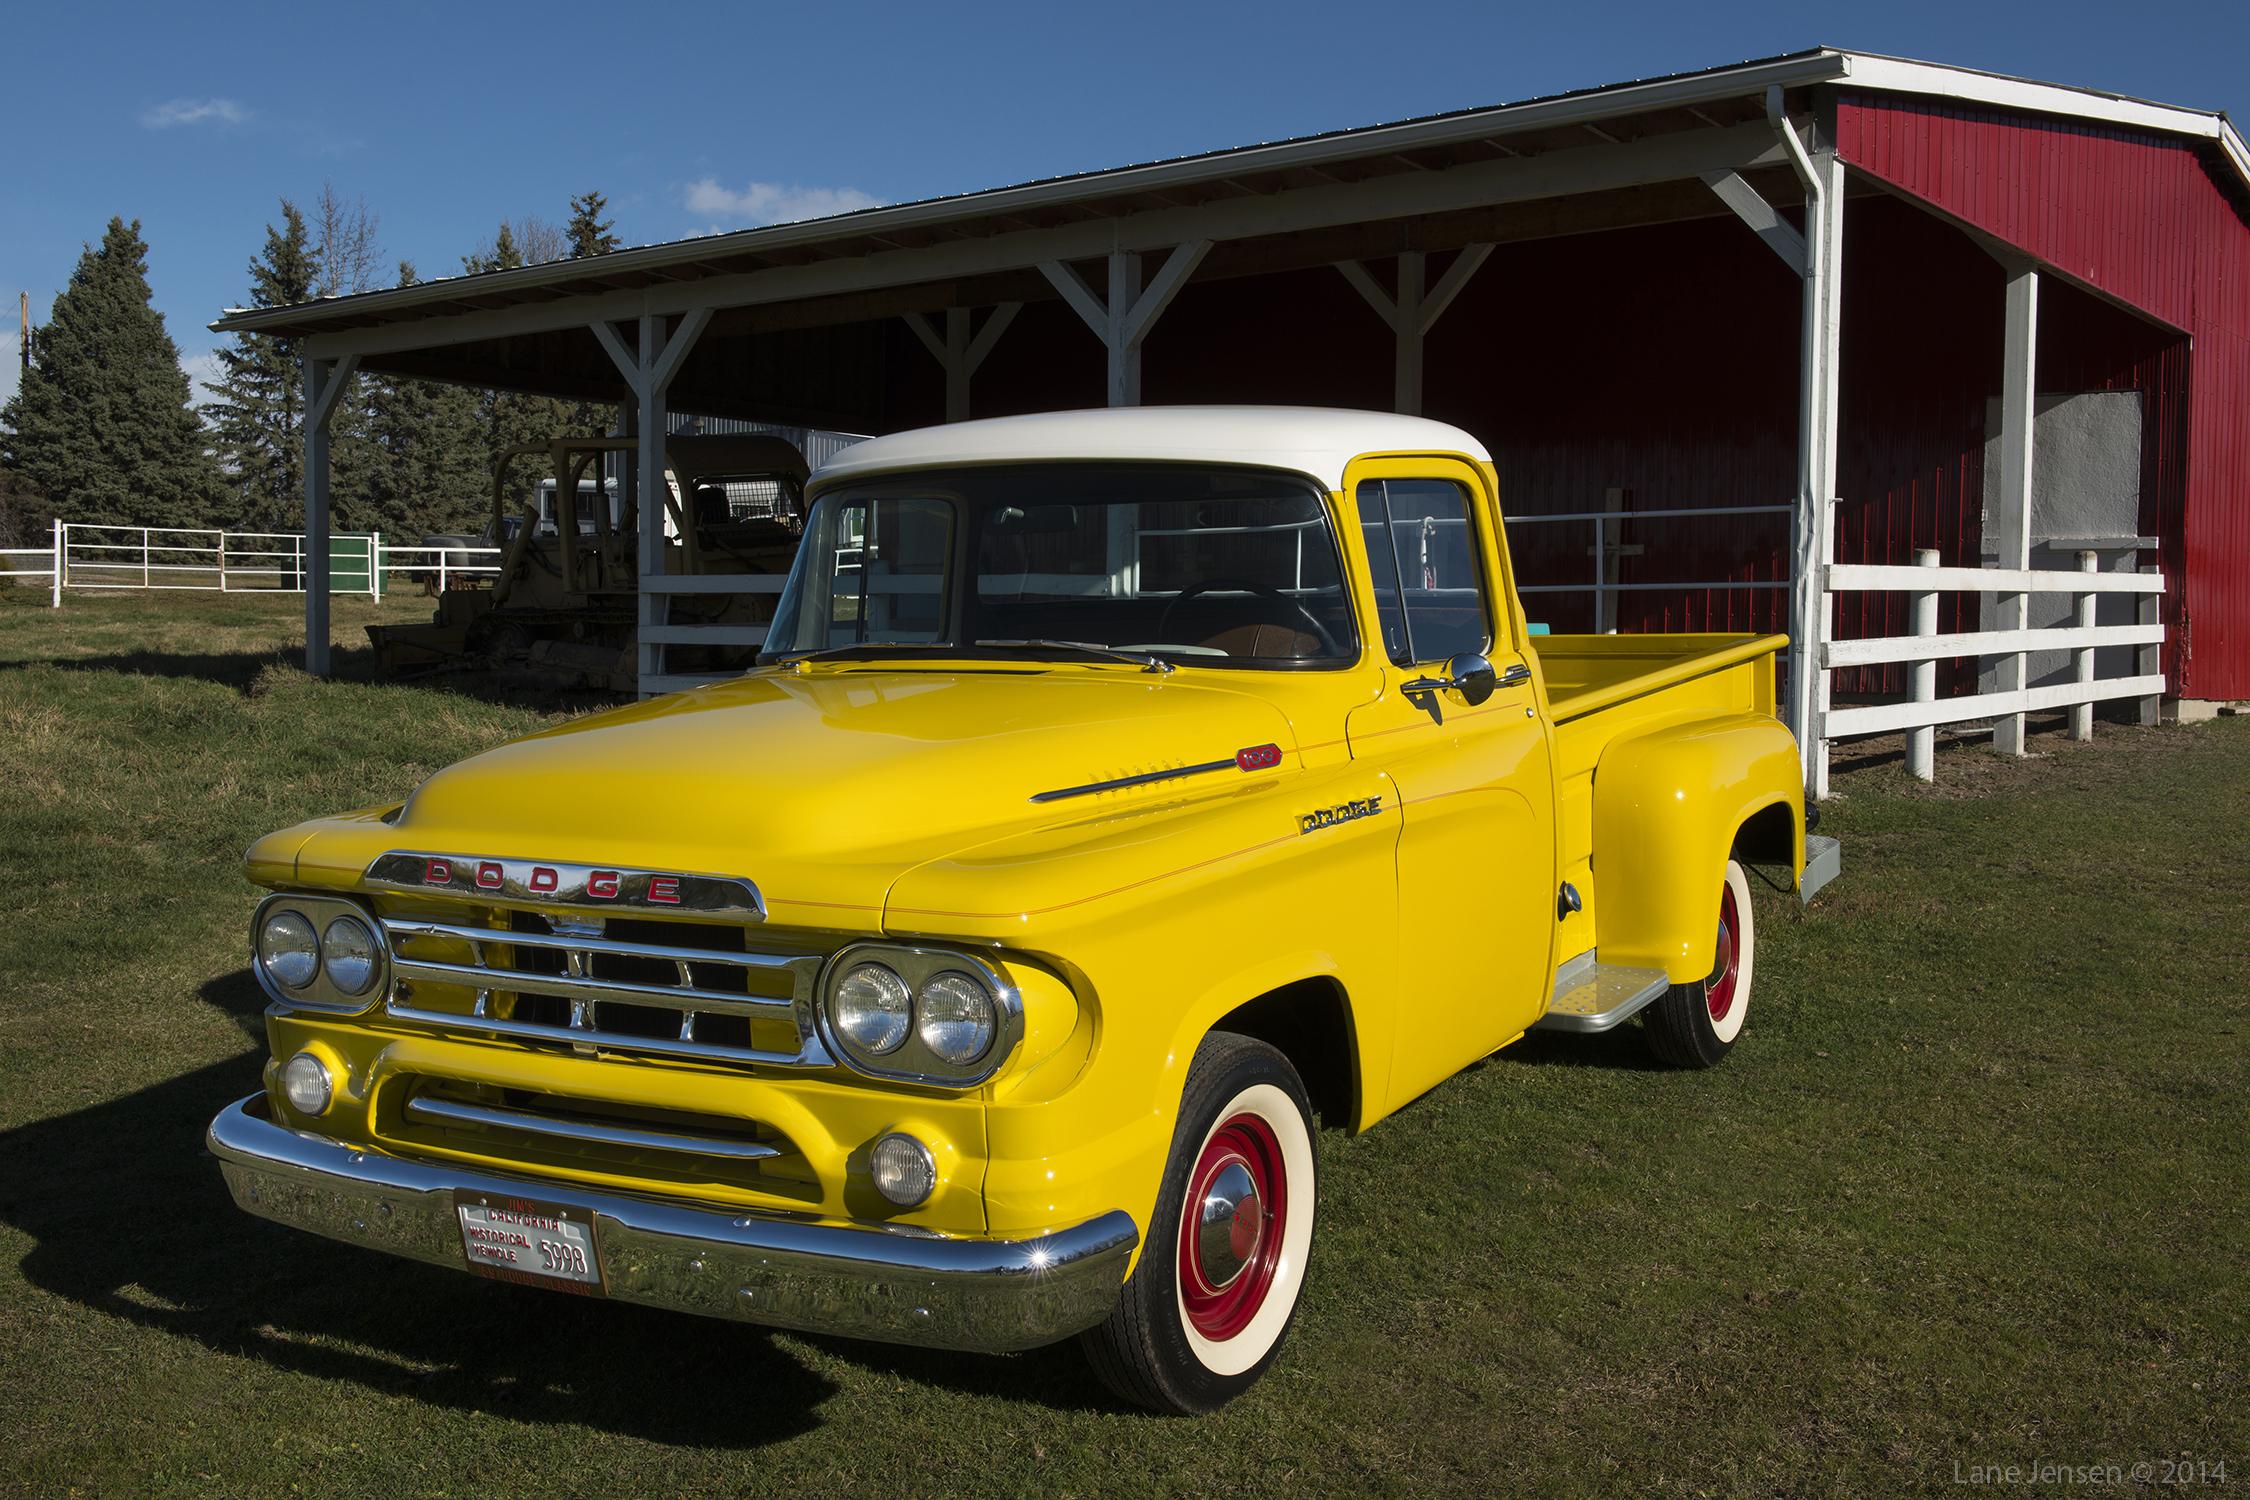 1959 Dodge Truck 16 x 24 website.jpg